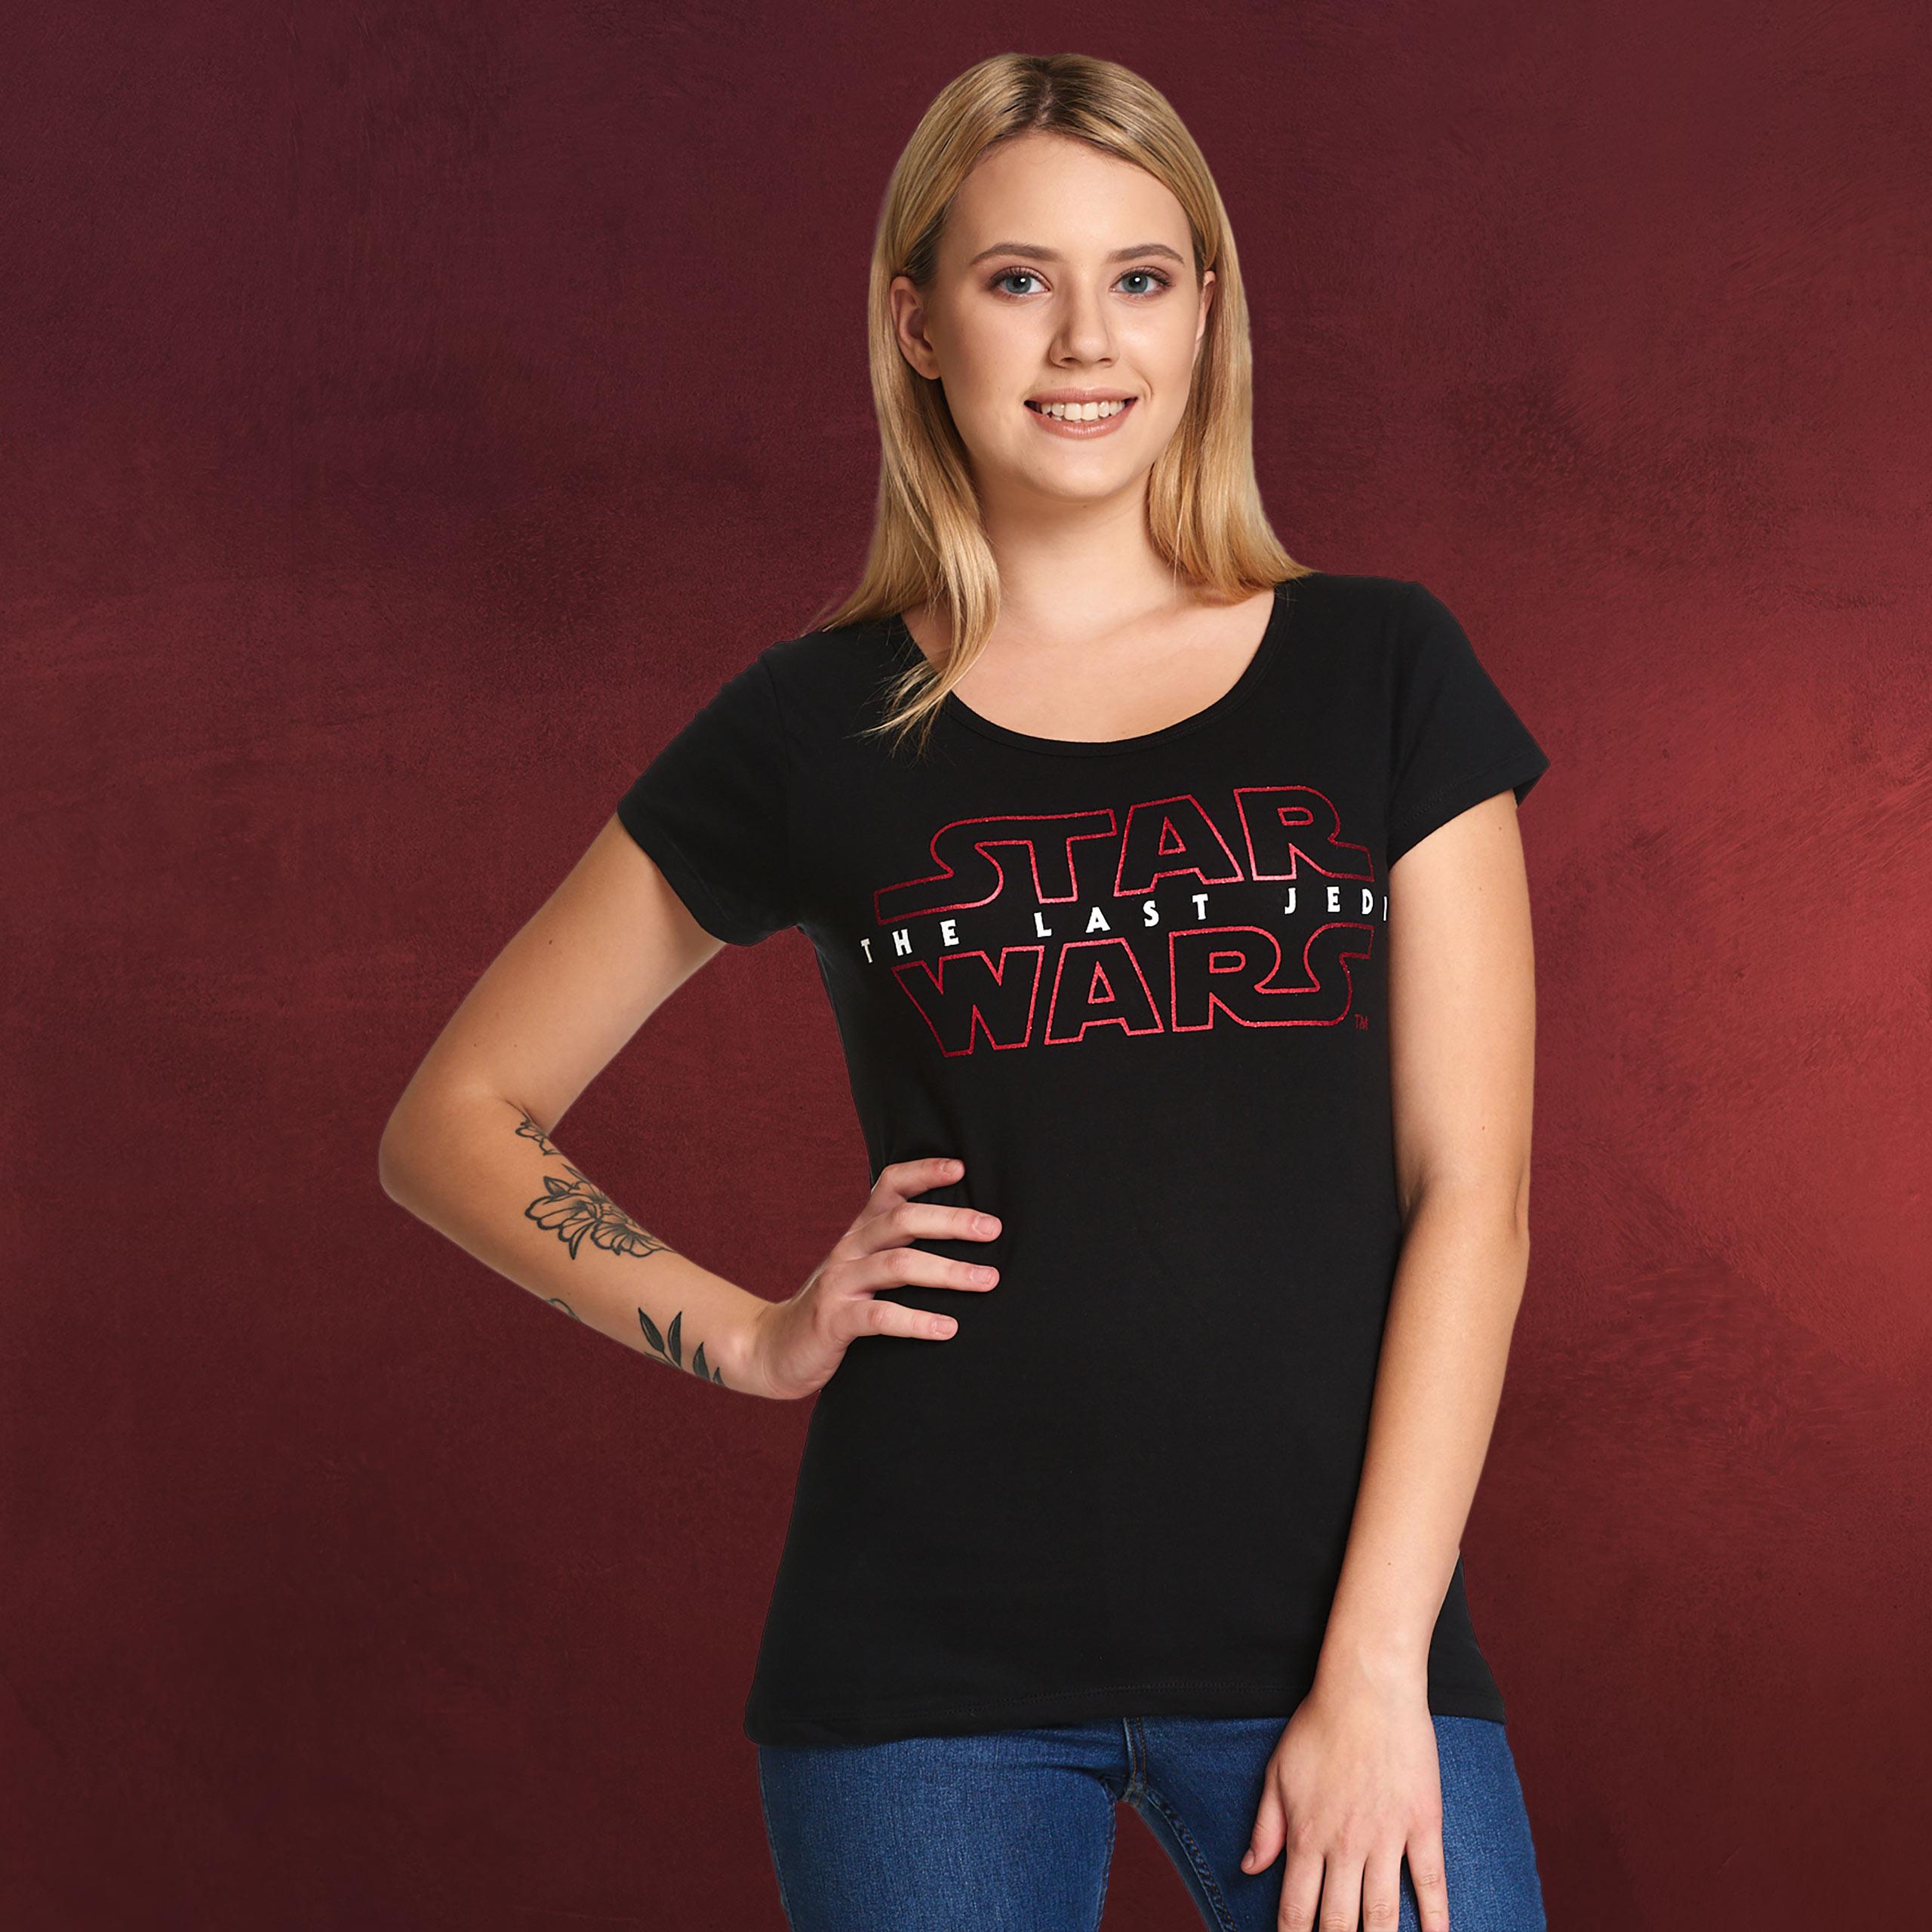 star wars the last jedi logo t shirt damen schwarz. Black Bedroom Furniture Sets. Home Design Ideas